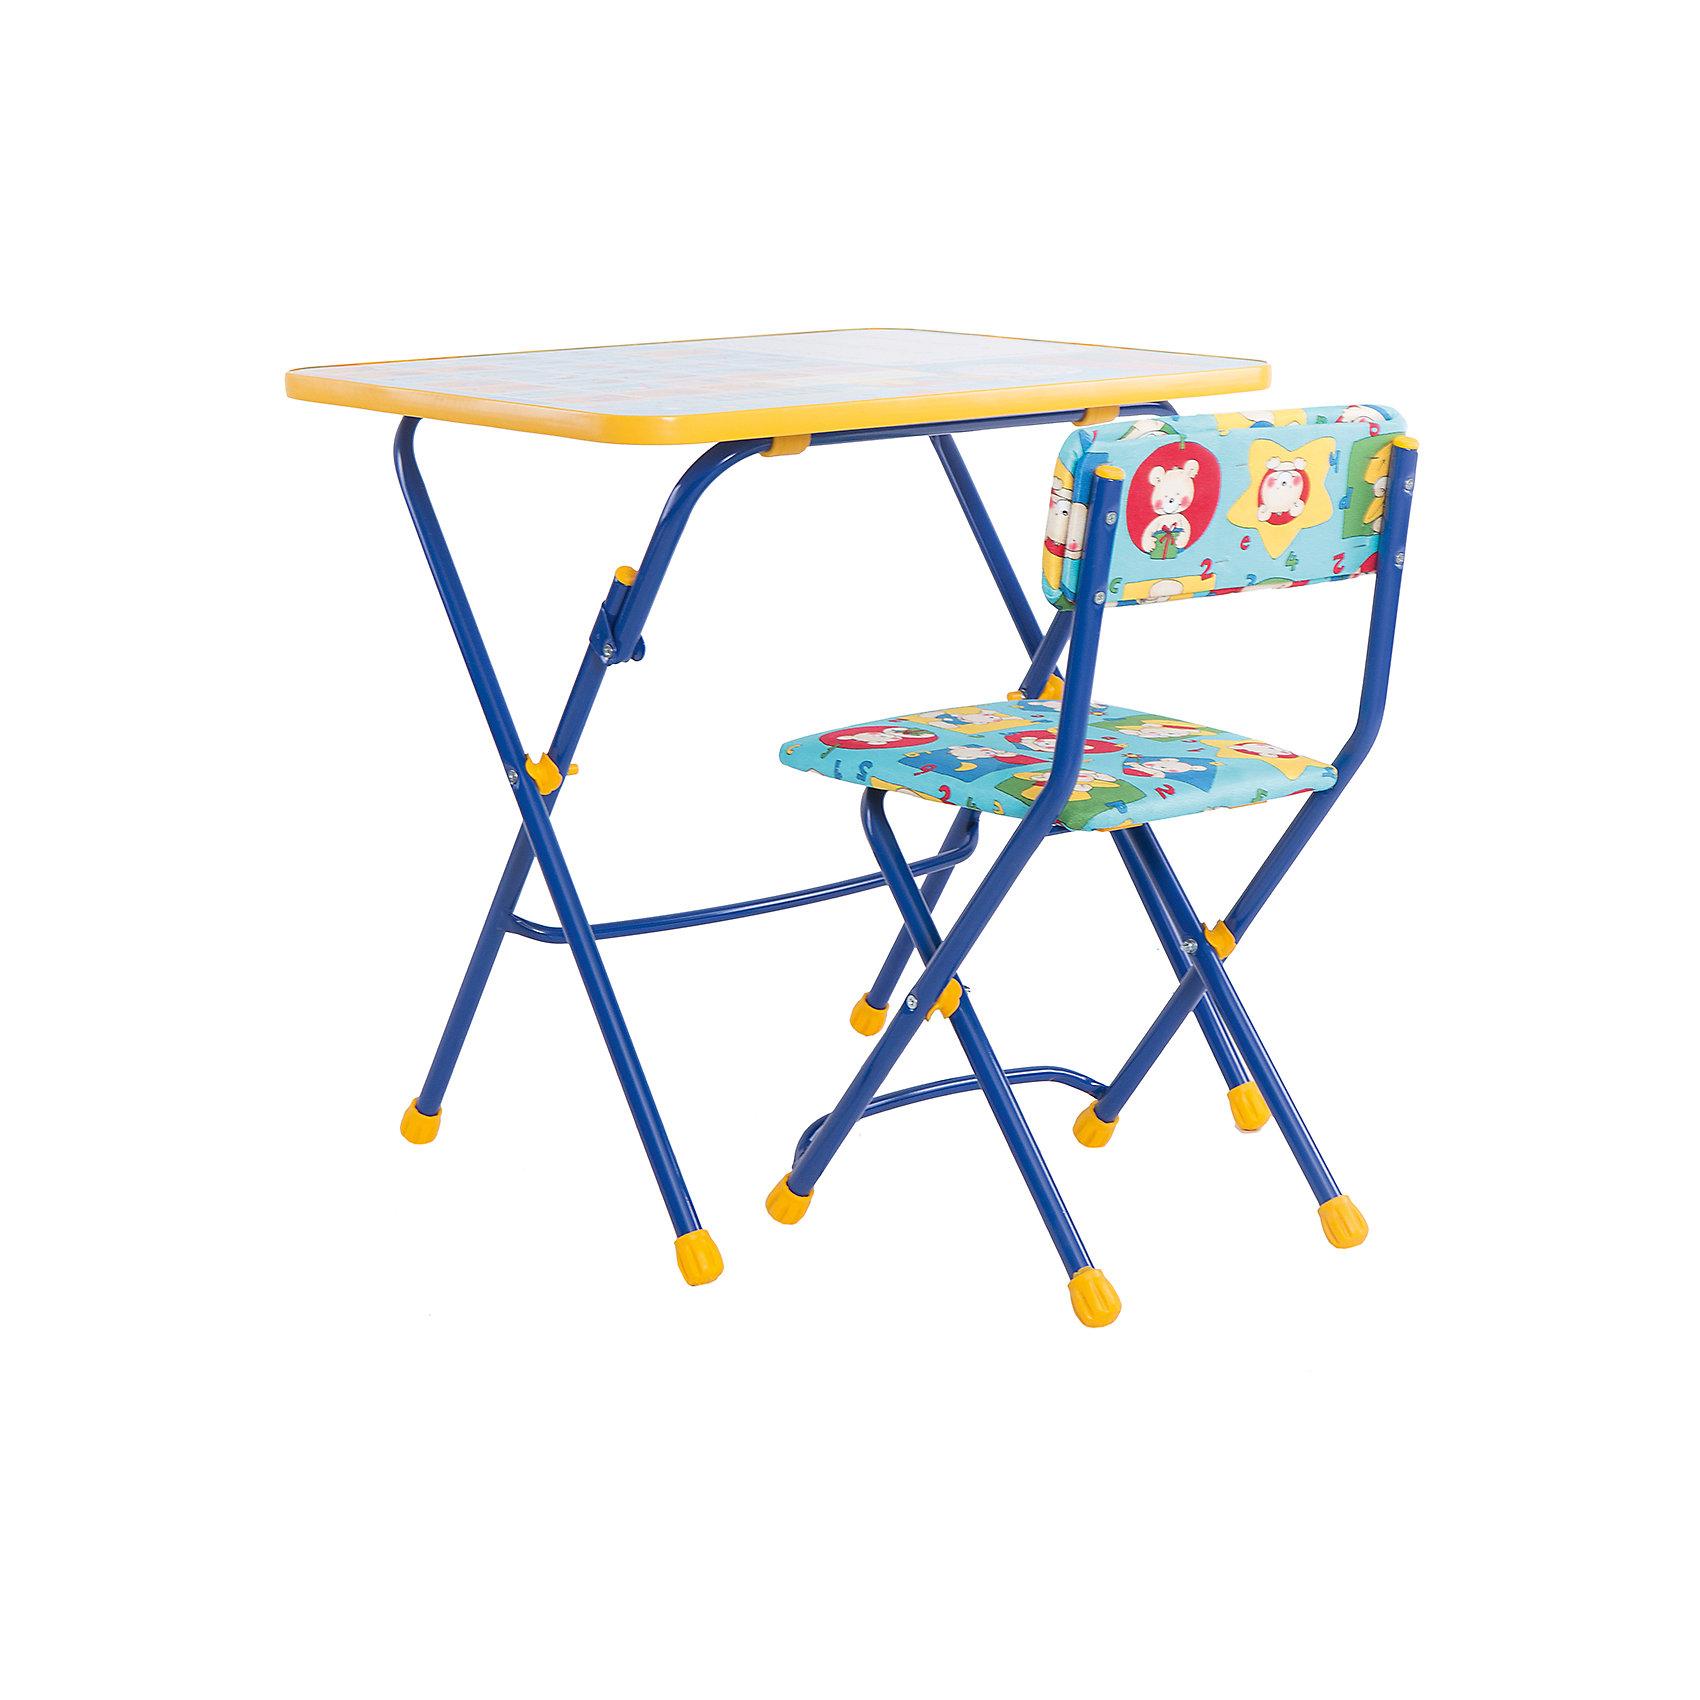 Ника Набор мебели Первоклашка. Осень (синий) ника набор мебели первоклашка осень синий